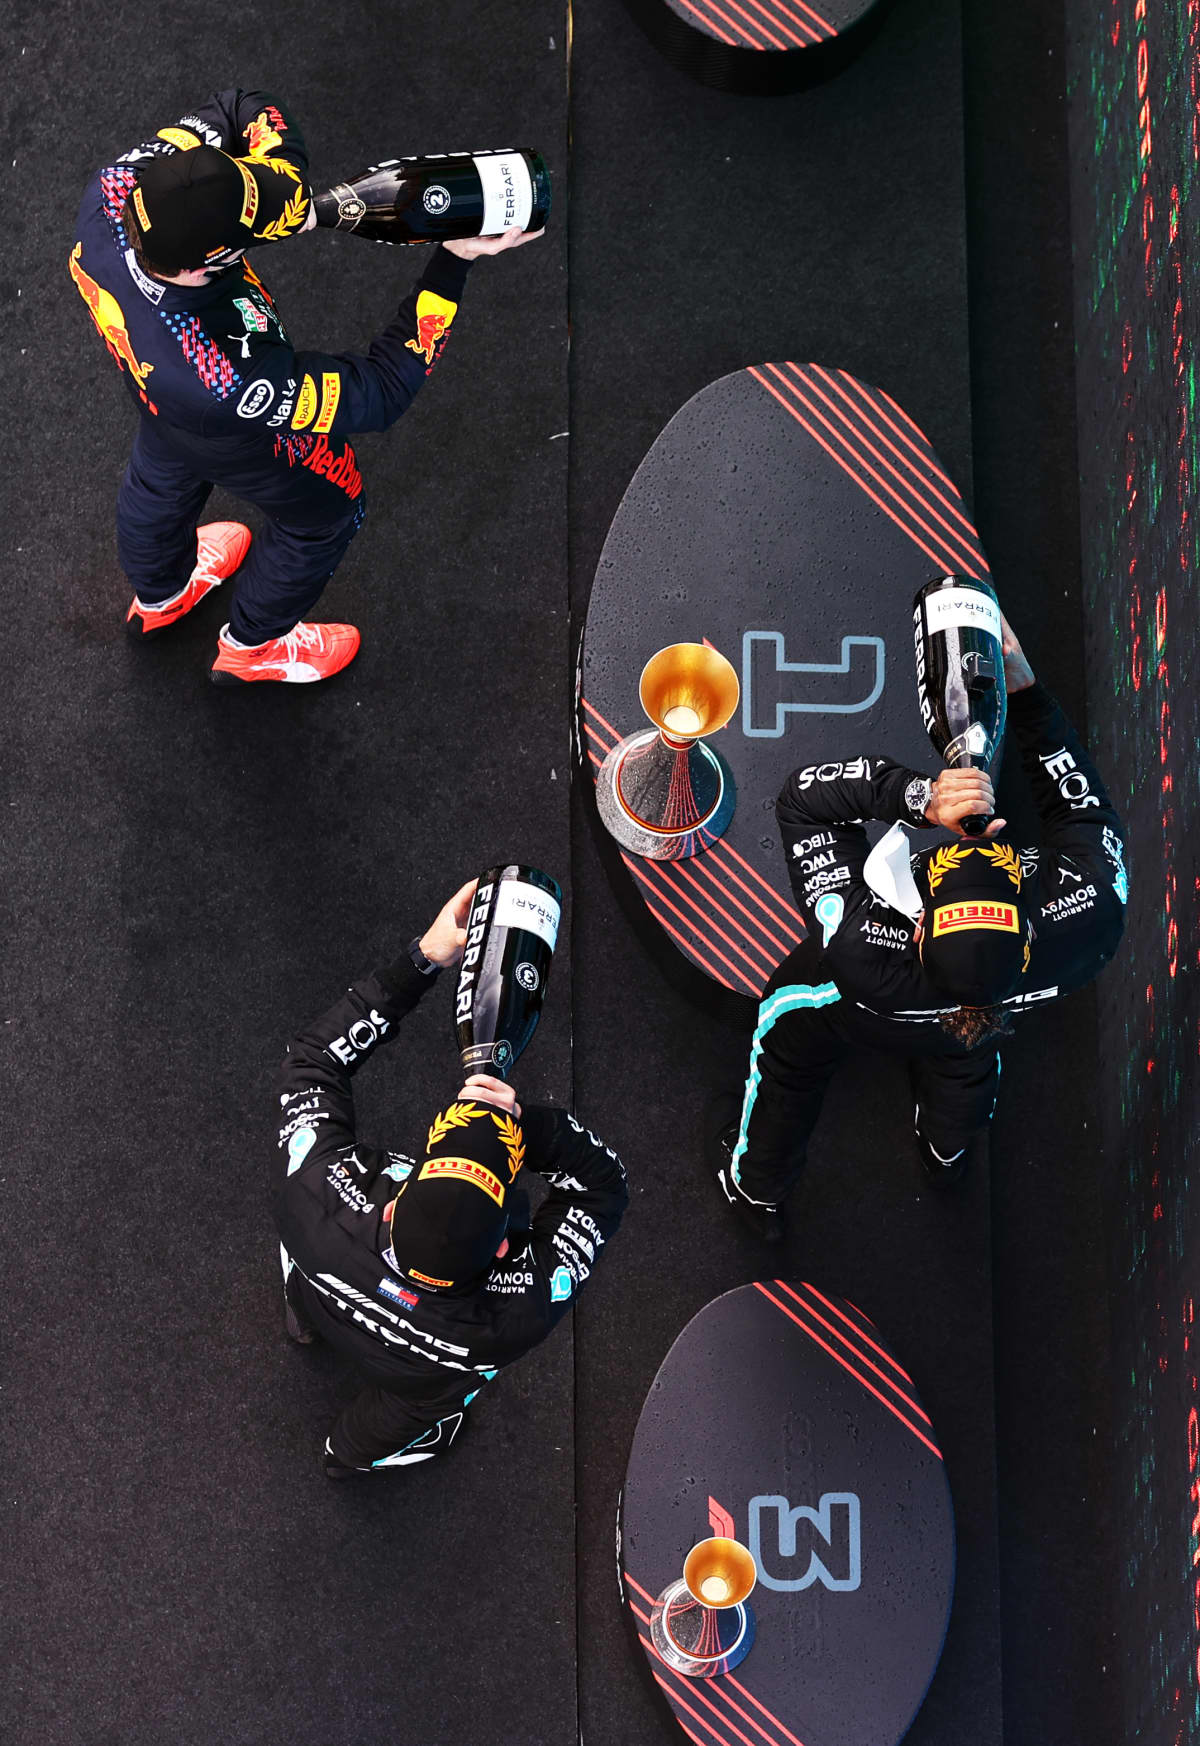 Verstappen, Hamilton, Bottas